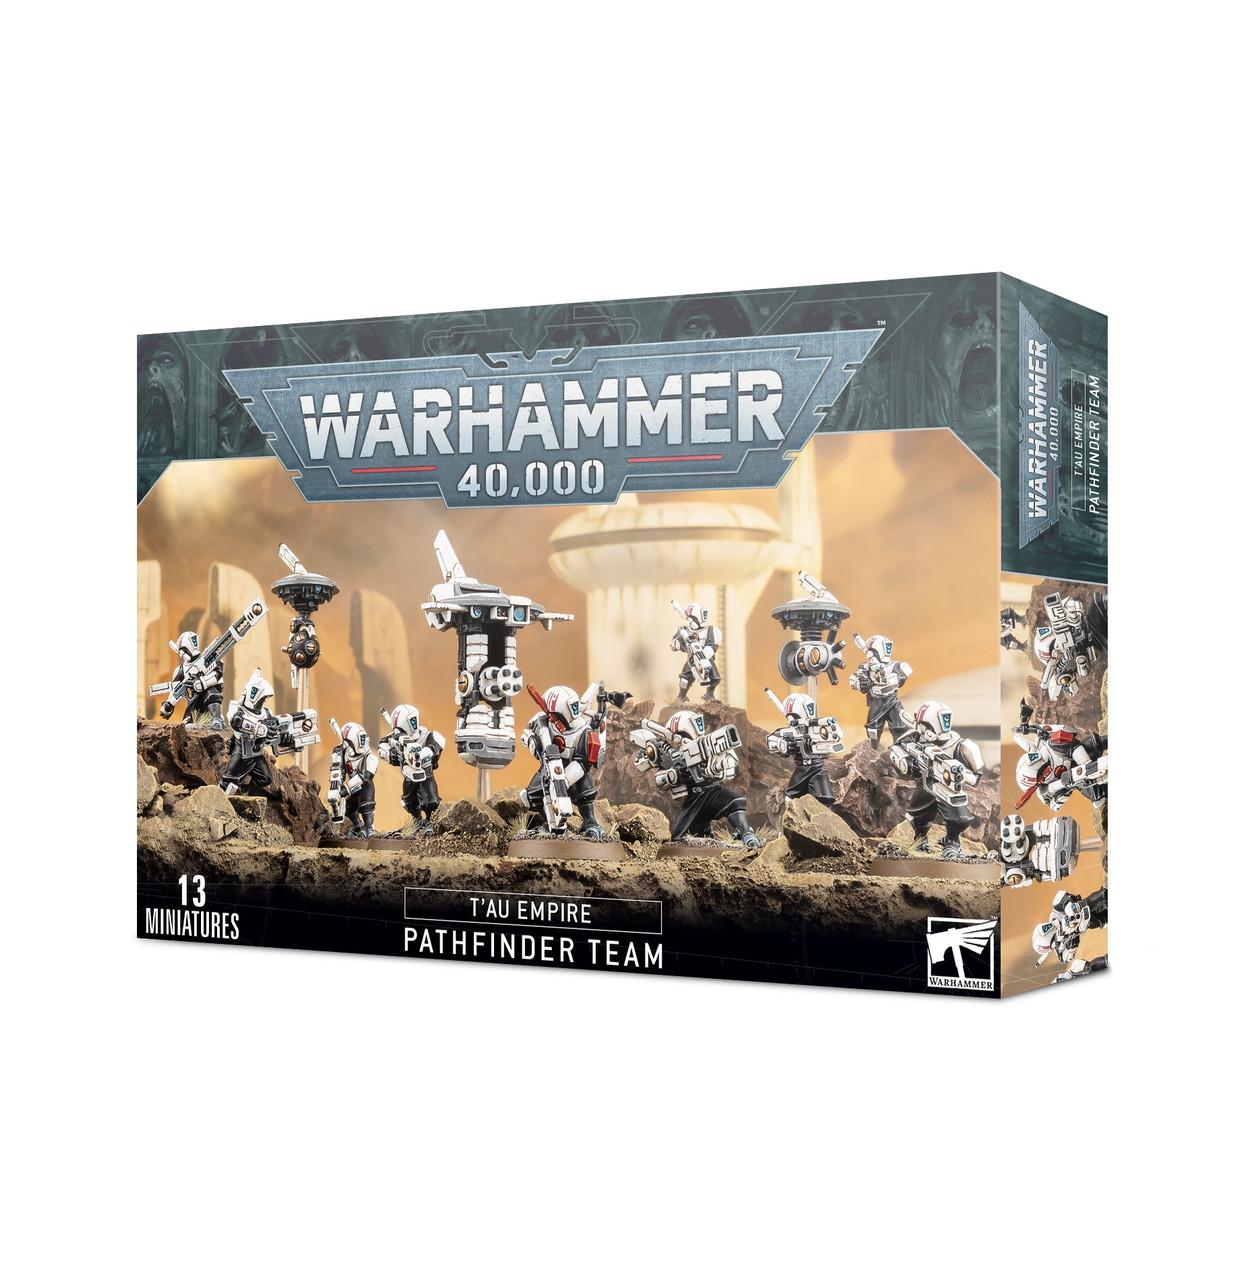 Warhammer 40,000 Tau Empire Pathfinder Team Tau Empire